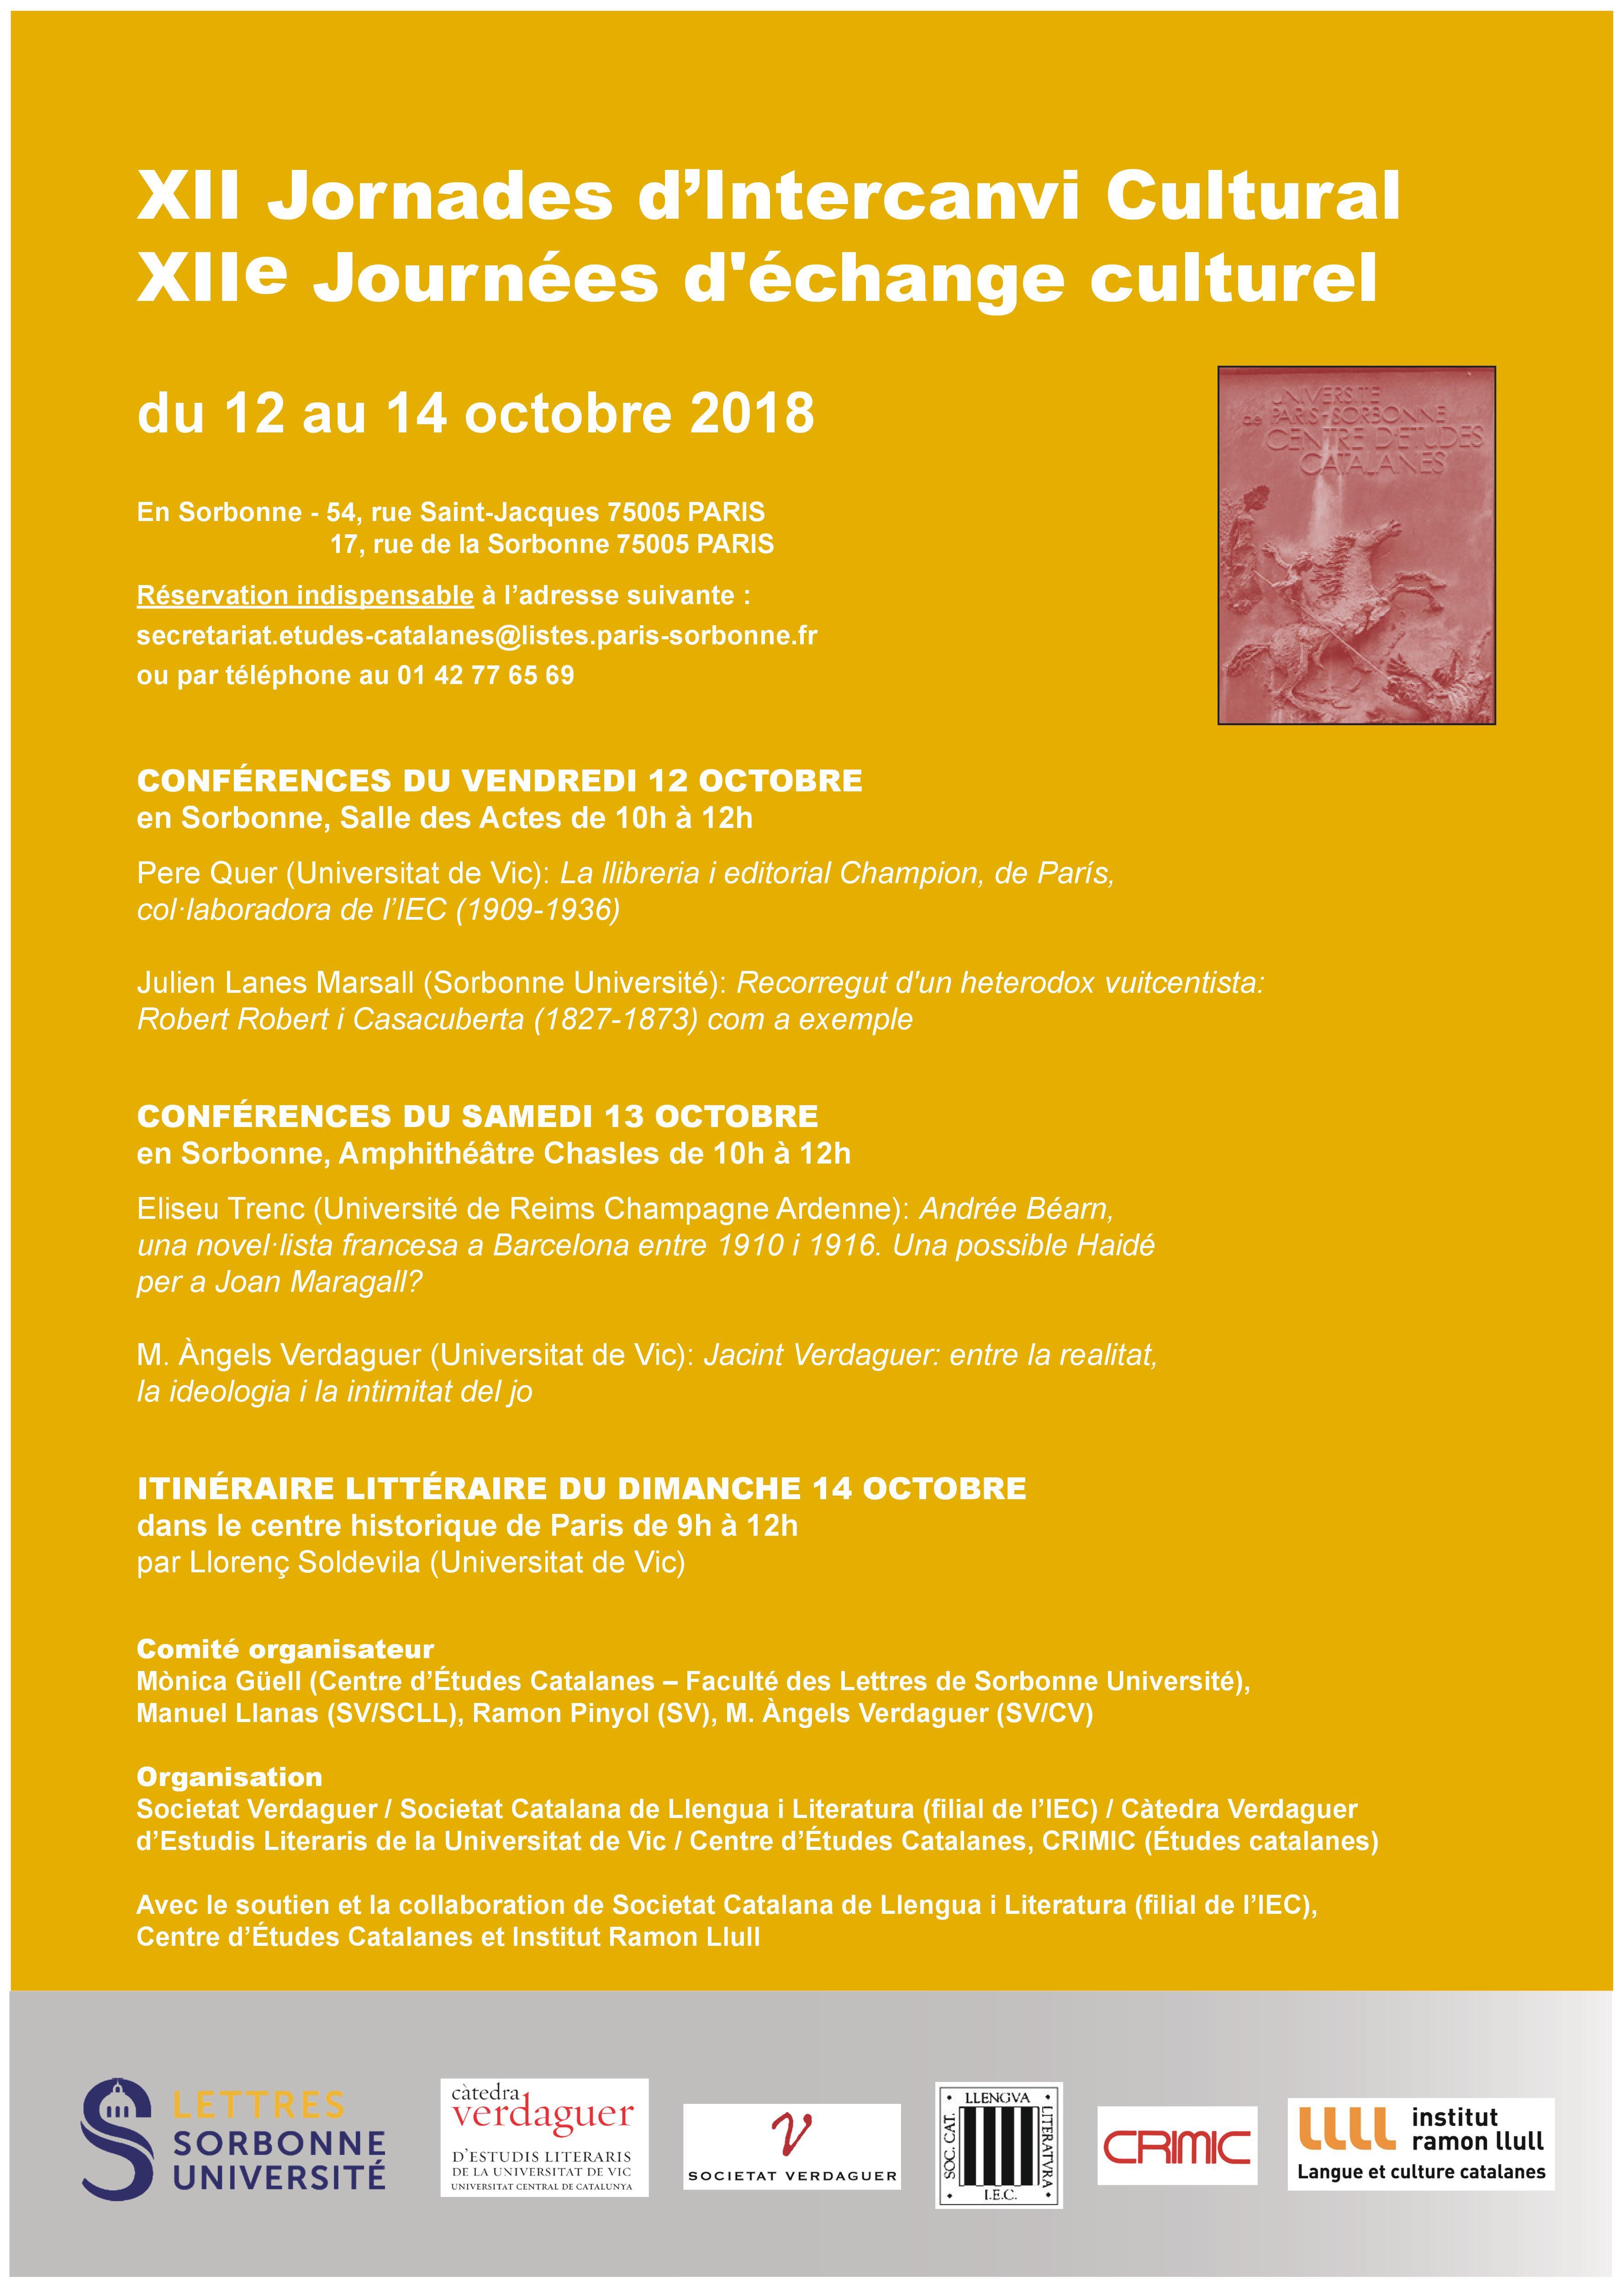 XII Jornades d'intercanvi cultural / XII Journées d'échanges culturels